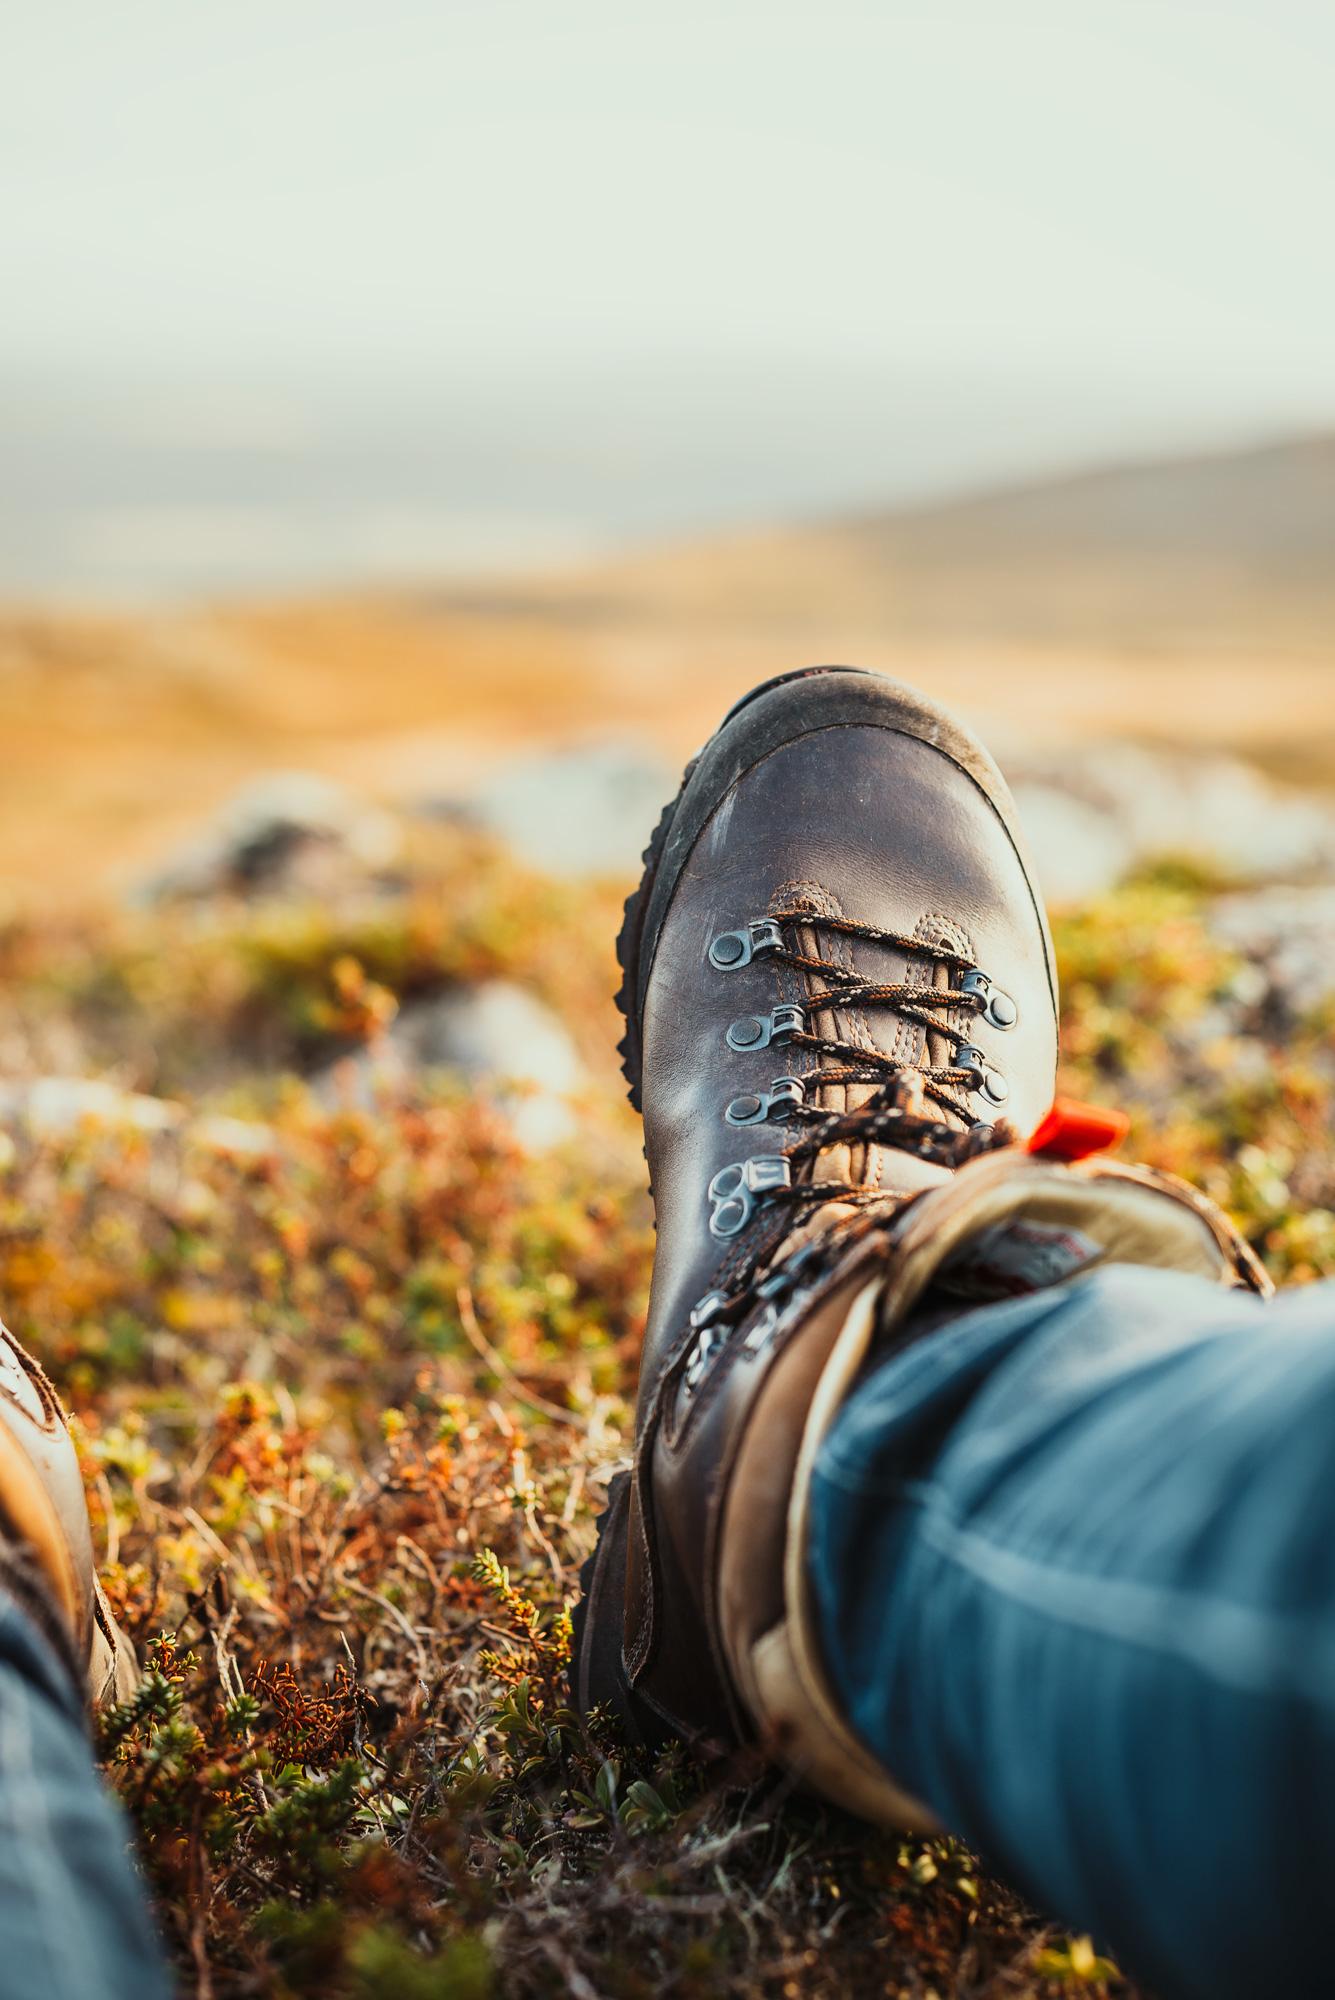 Hiking shoe in the fall